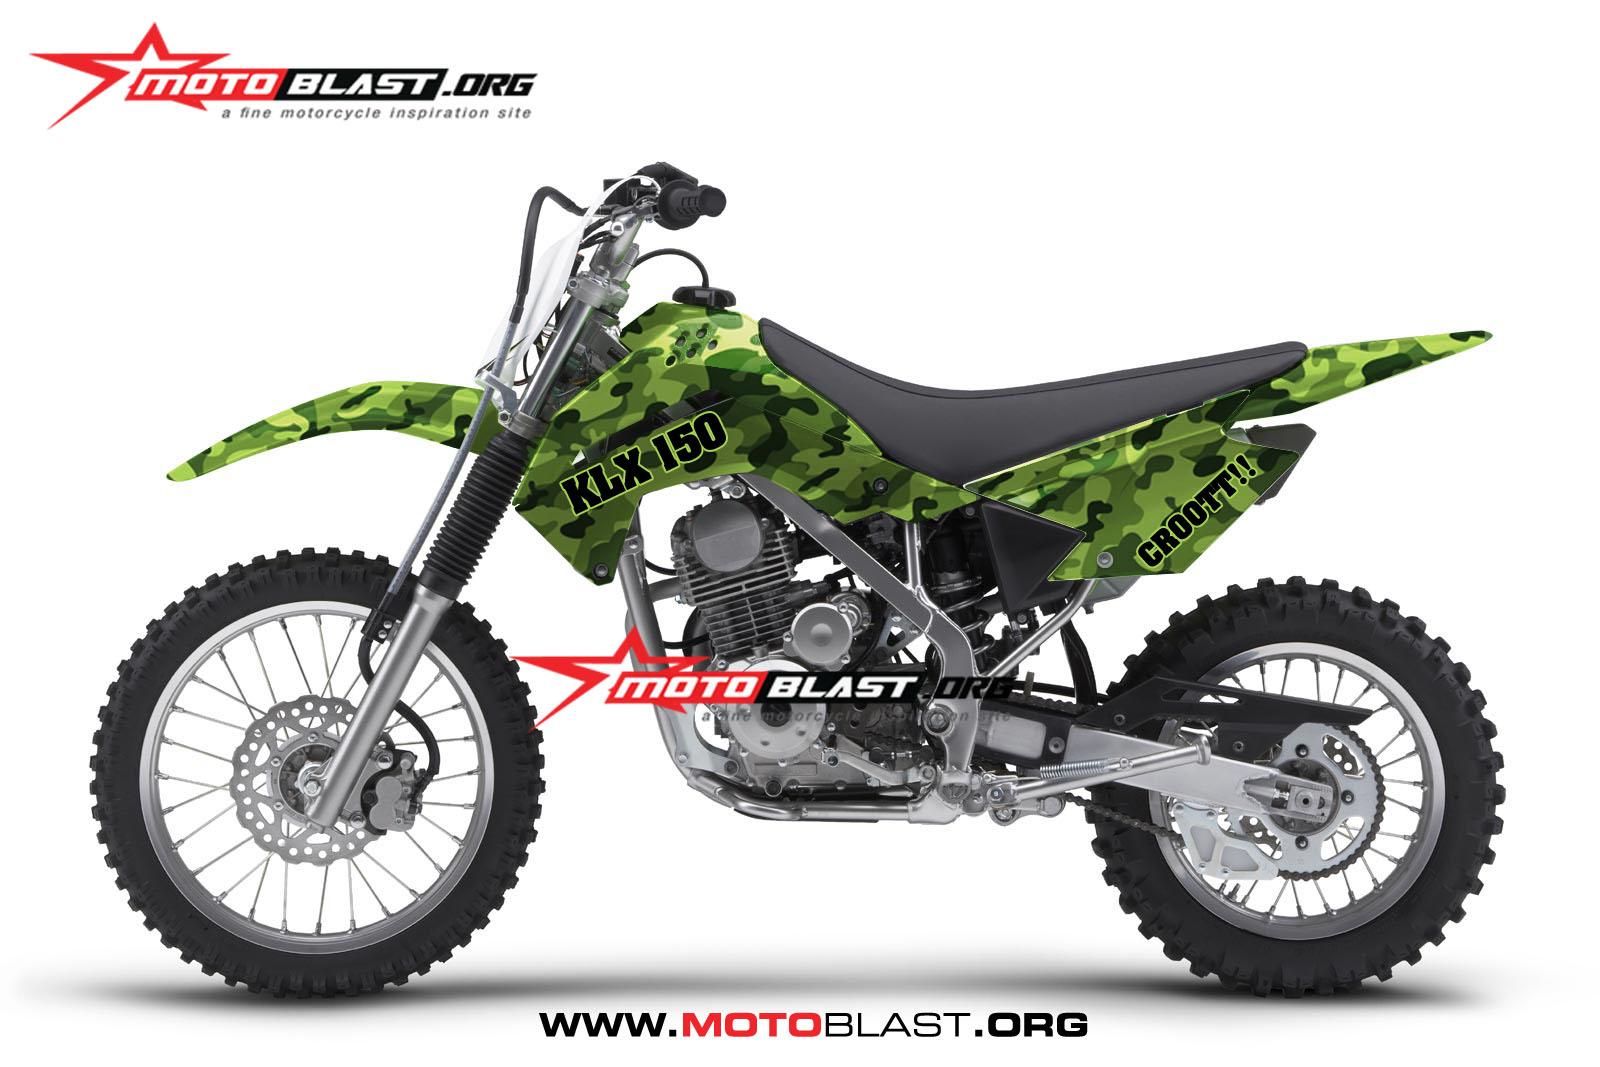 Grafis inspirasi modif striping kawasaki klx 150 army motoblast